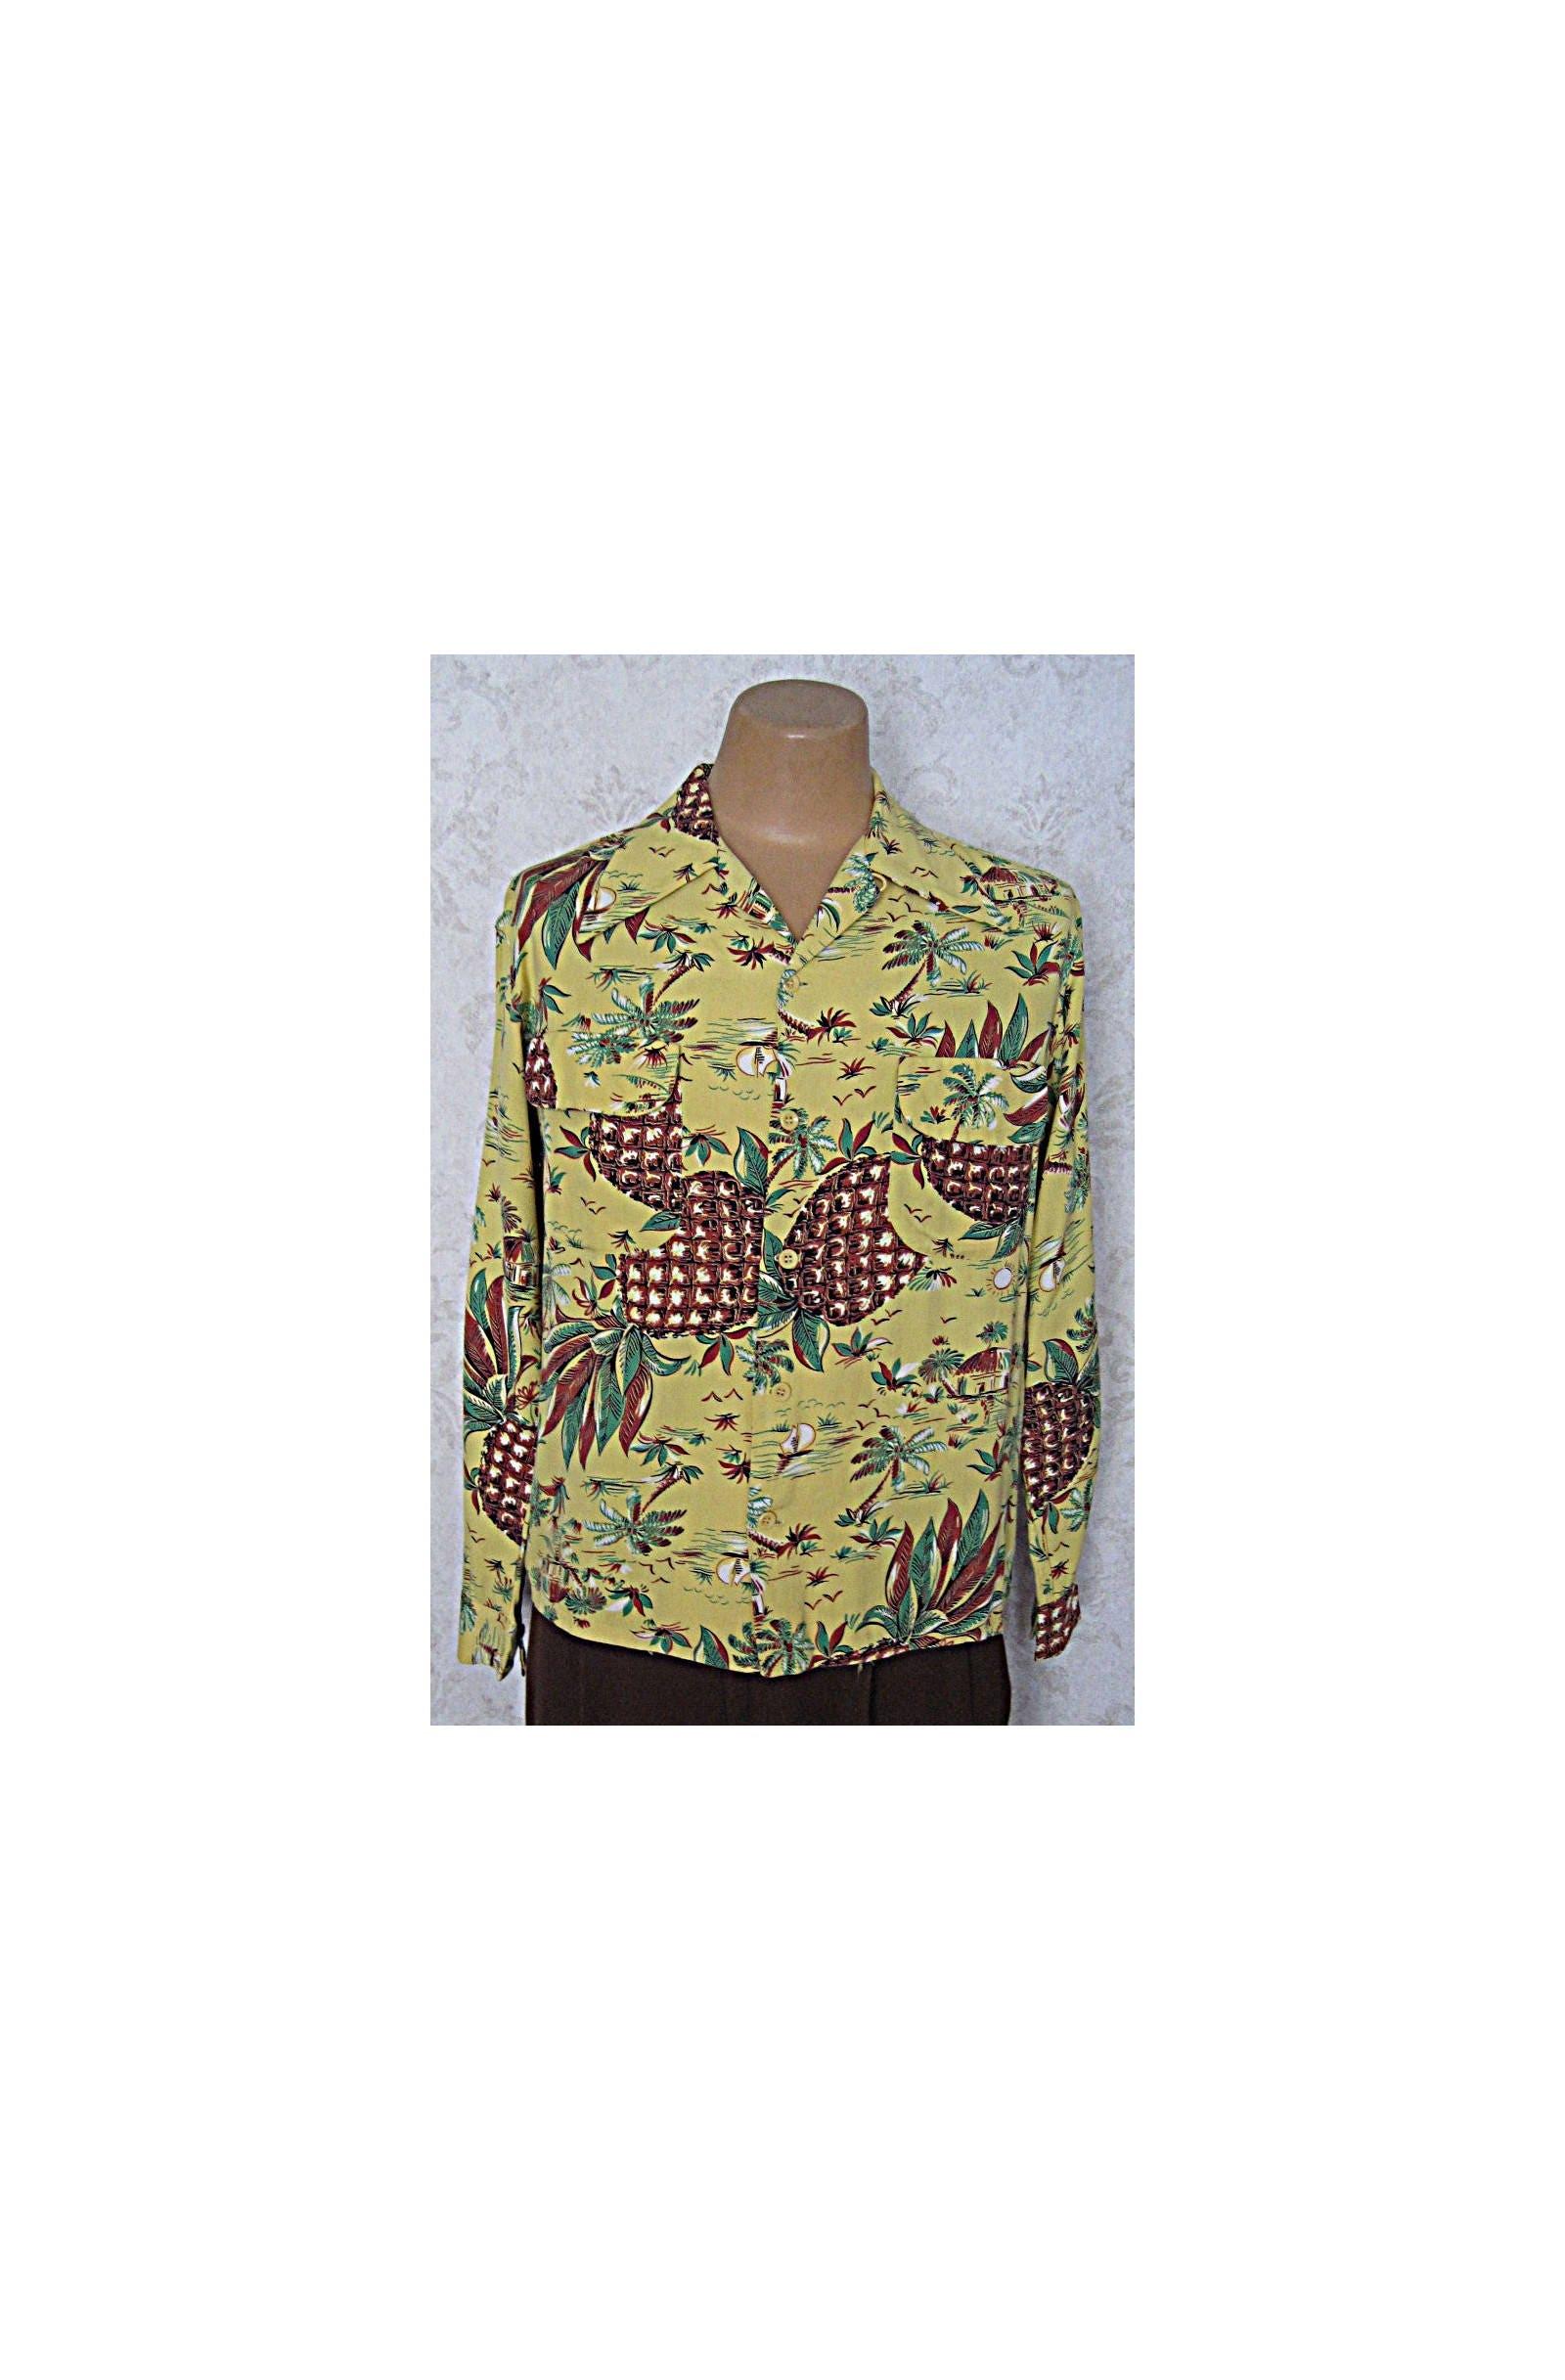 1940s Mens Ties | Wide Ties & Painted Ties Vintage 1940S 1950S Long Sleeve Rayon Hawaiian ShirtPineapple  Palm Novelty Print Mens Aloha $28.25 AT vintagedancer.com